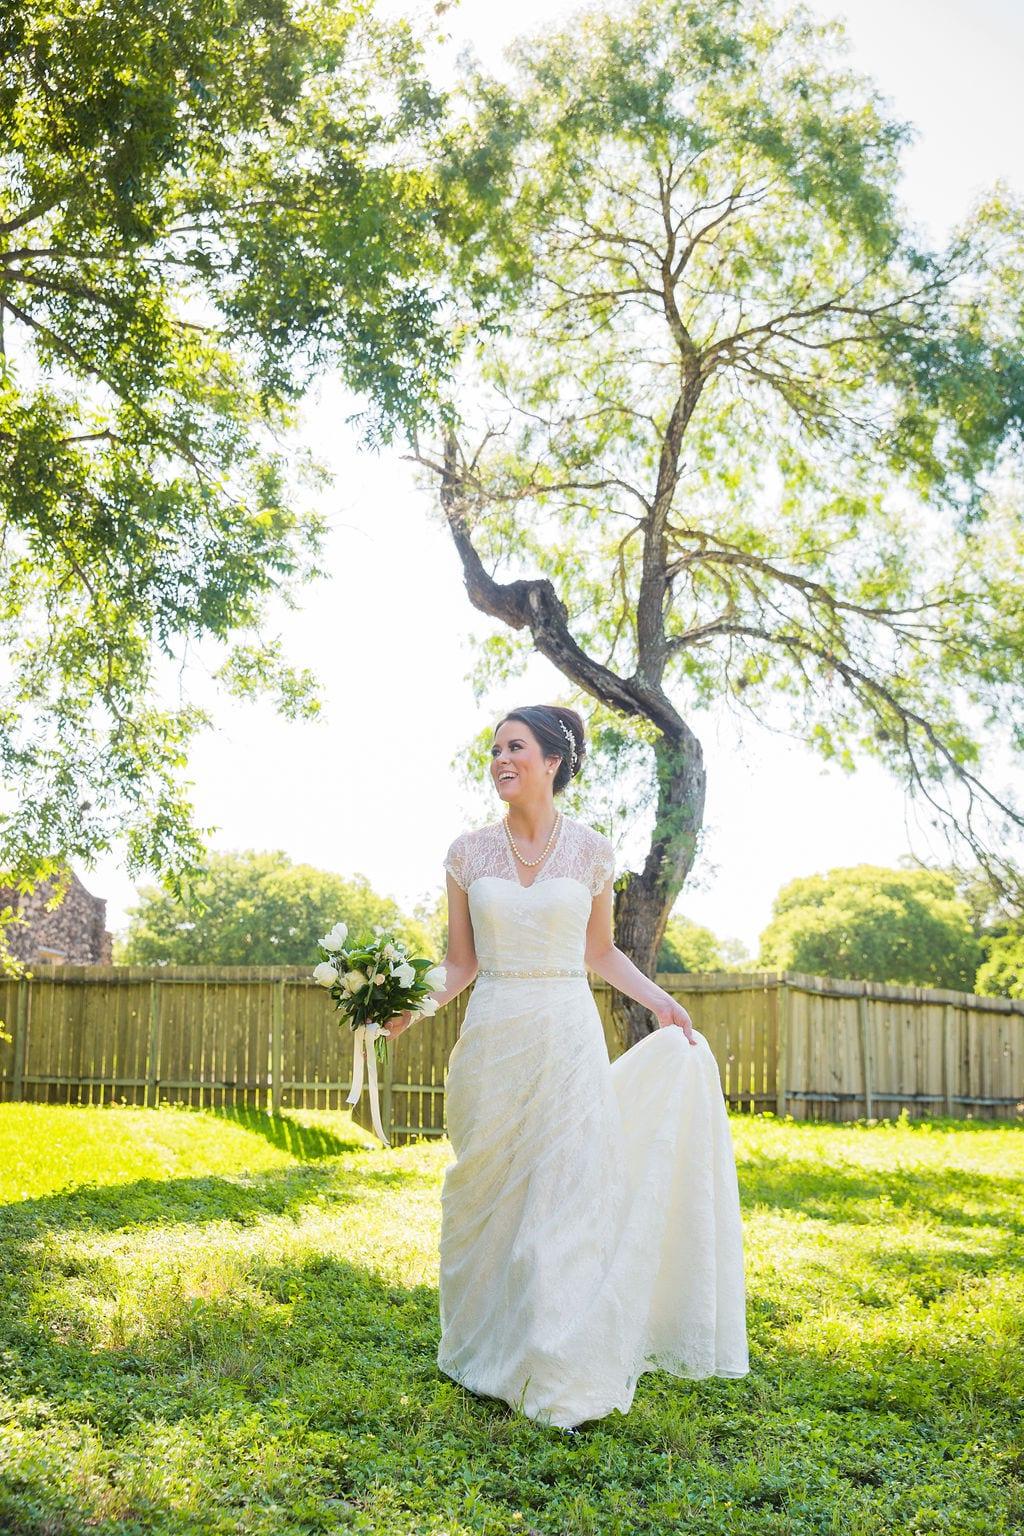 Aamber's bridal - mission San Jose Aamber walking